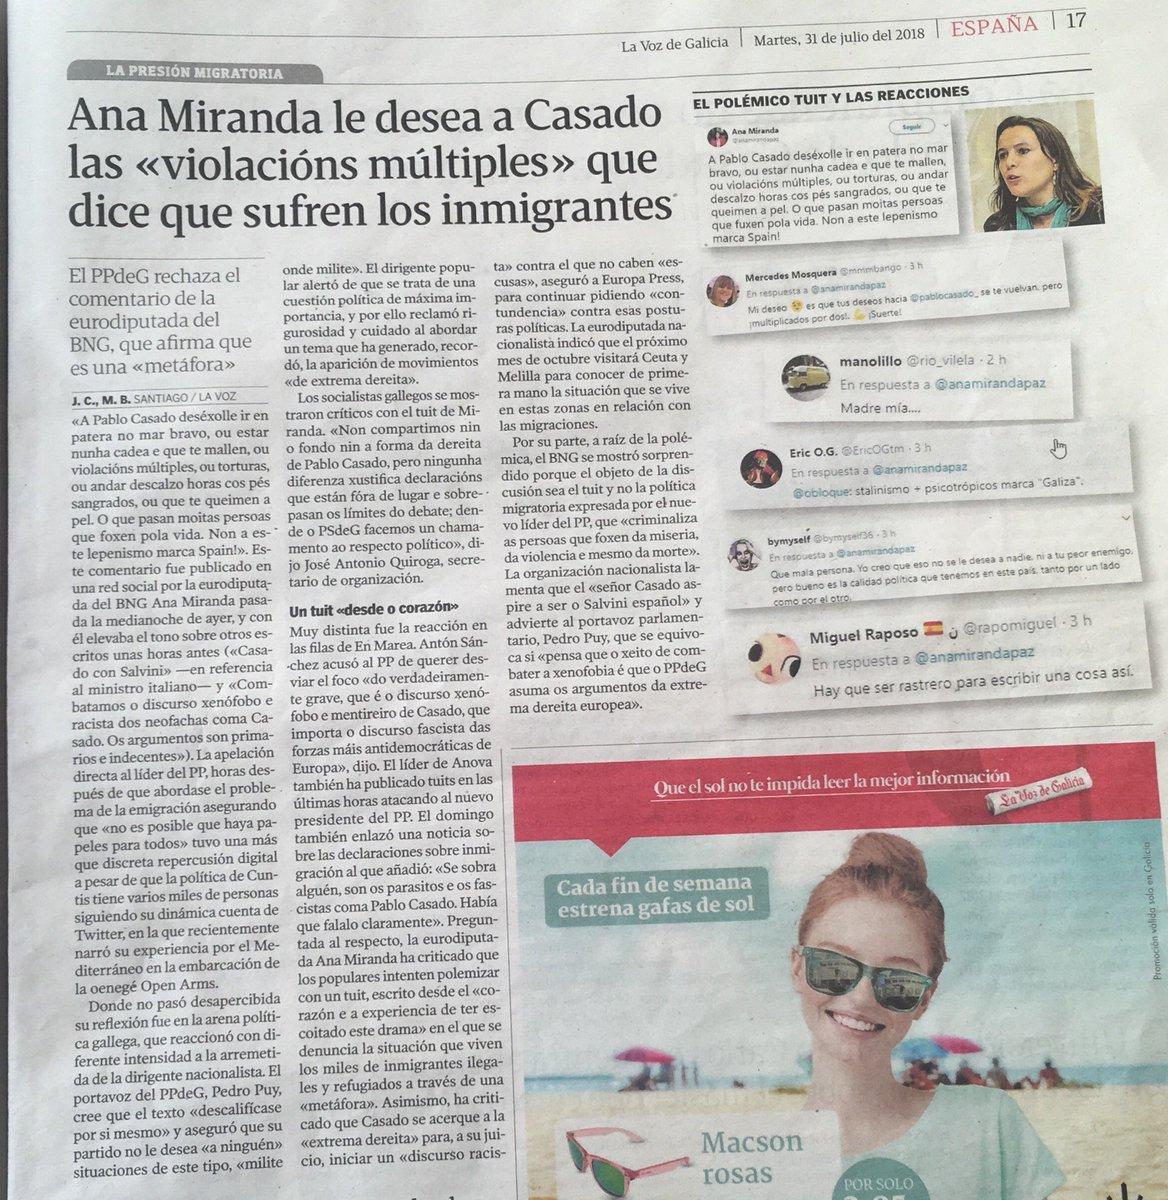 Desea Bng On A Pastor TwitterUna Eurodiputada Del Le Natalia vN8n0wm